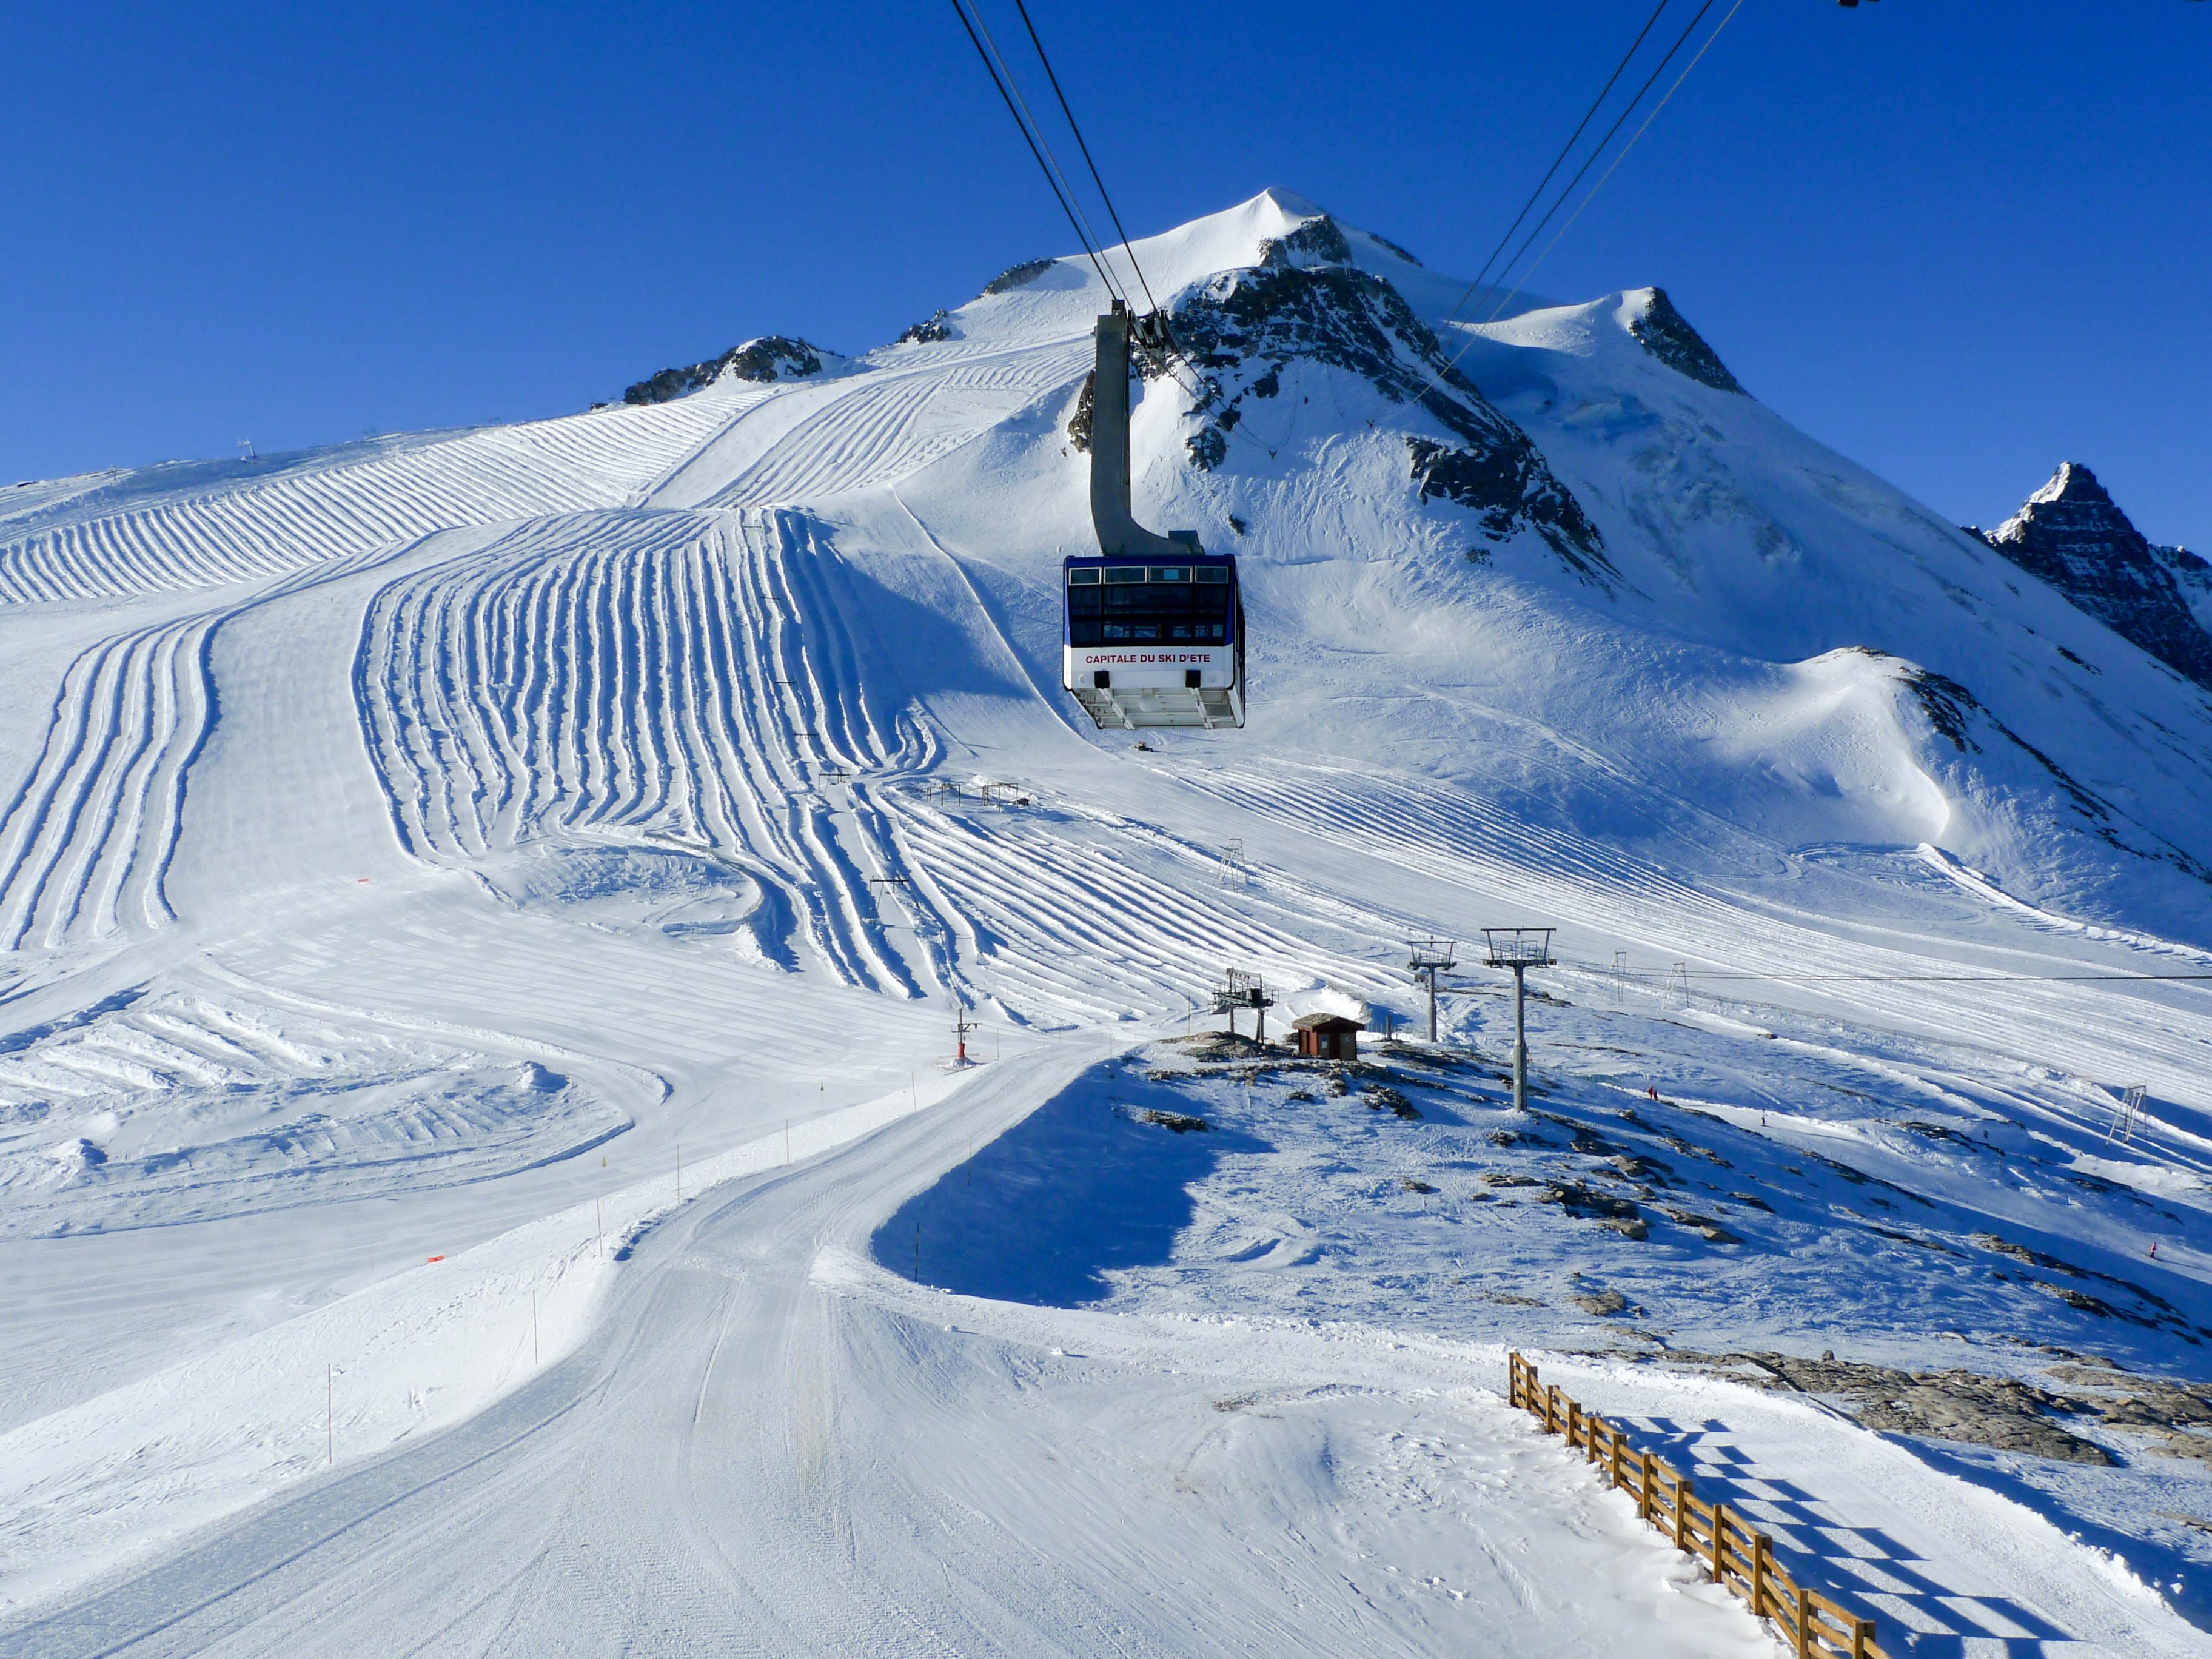 Lift at ski resort Tignes France wallpapers and images 3648x2736